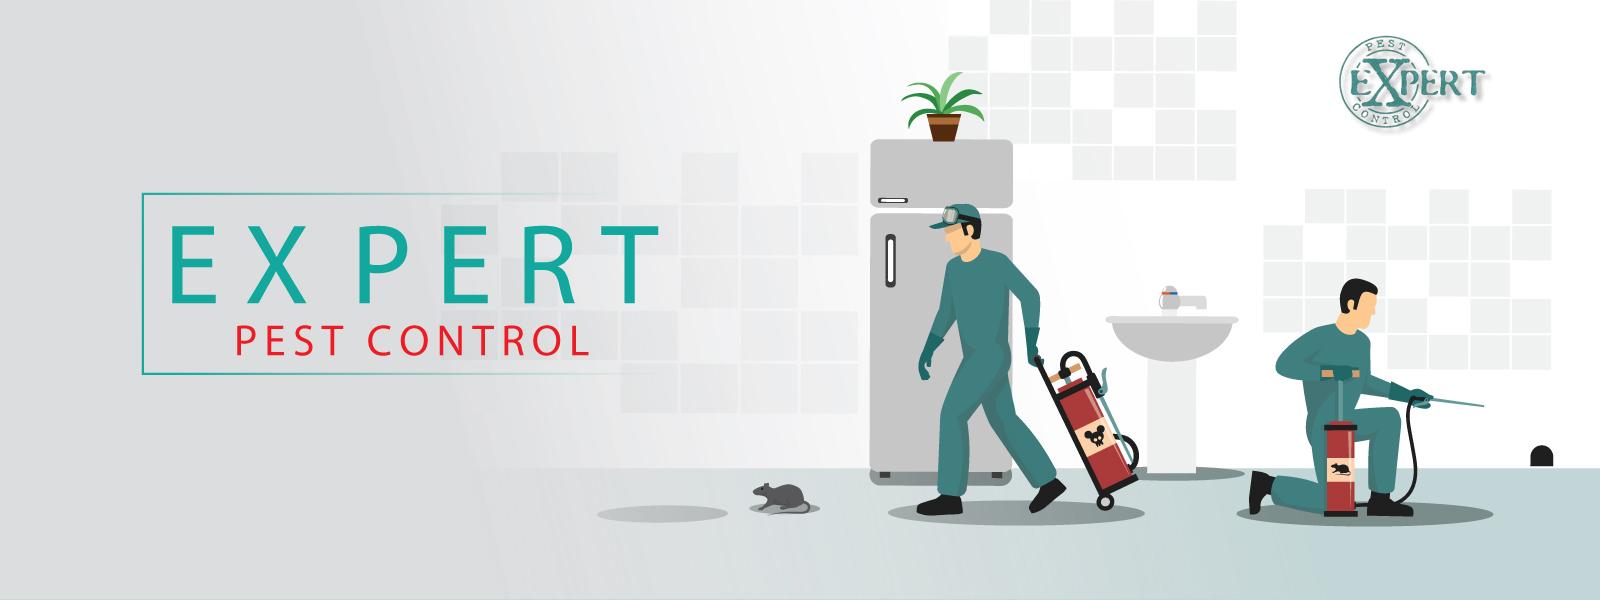 slider-expertpestcontrol-2